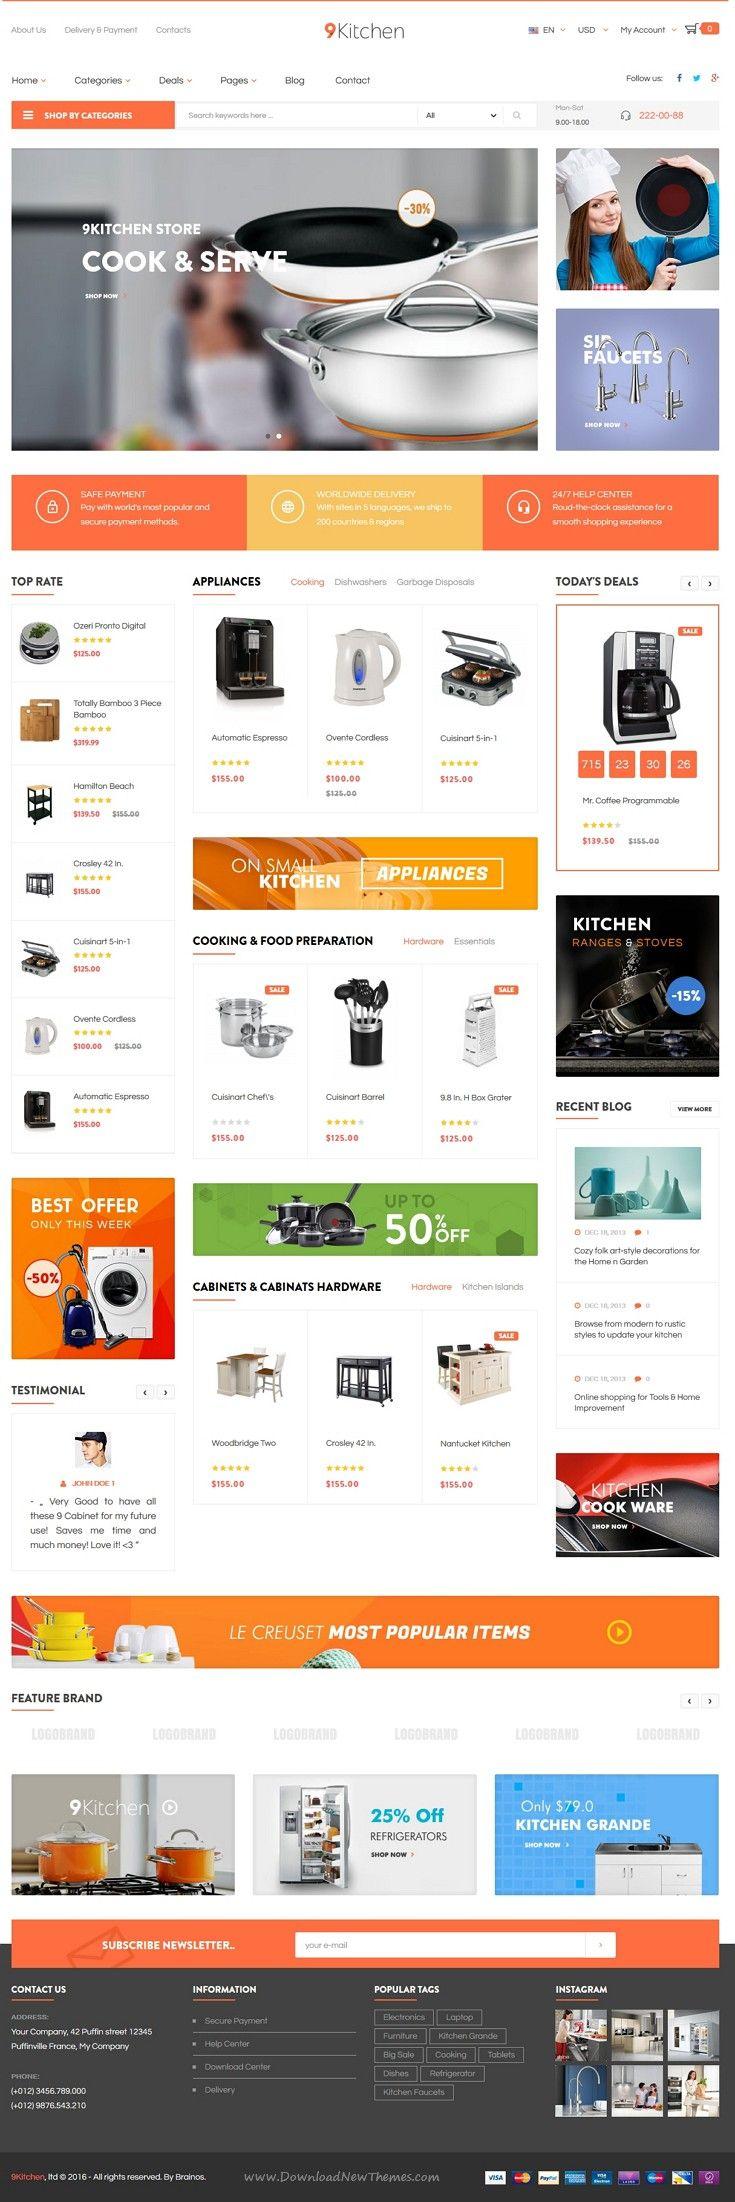 Pts Kitchen Is Advanced Responsive Prestashop Theme For Kitchen Supplies Store Website Comes With Prestashop Themes Kitchen Design Website Front Web Design